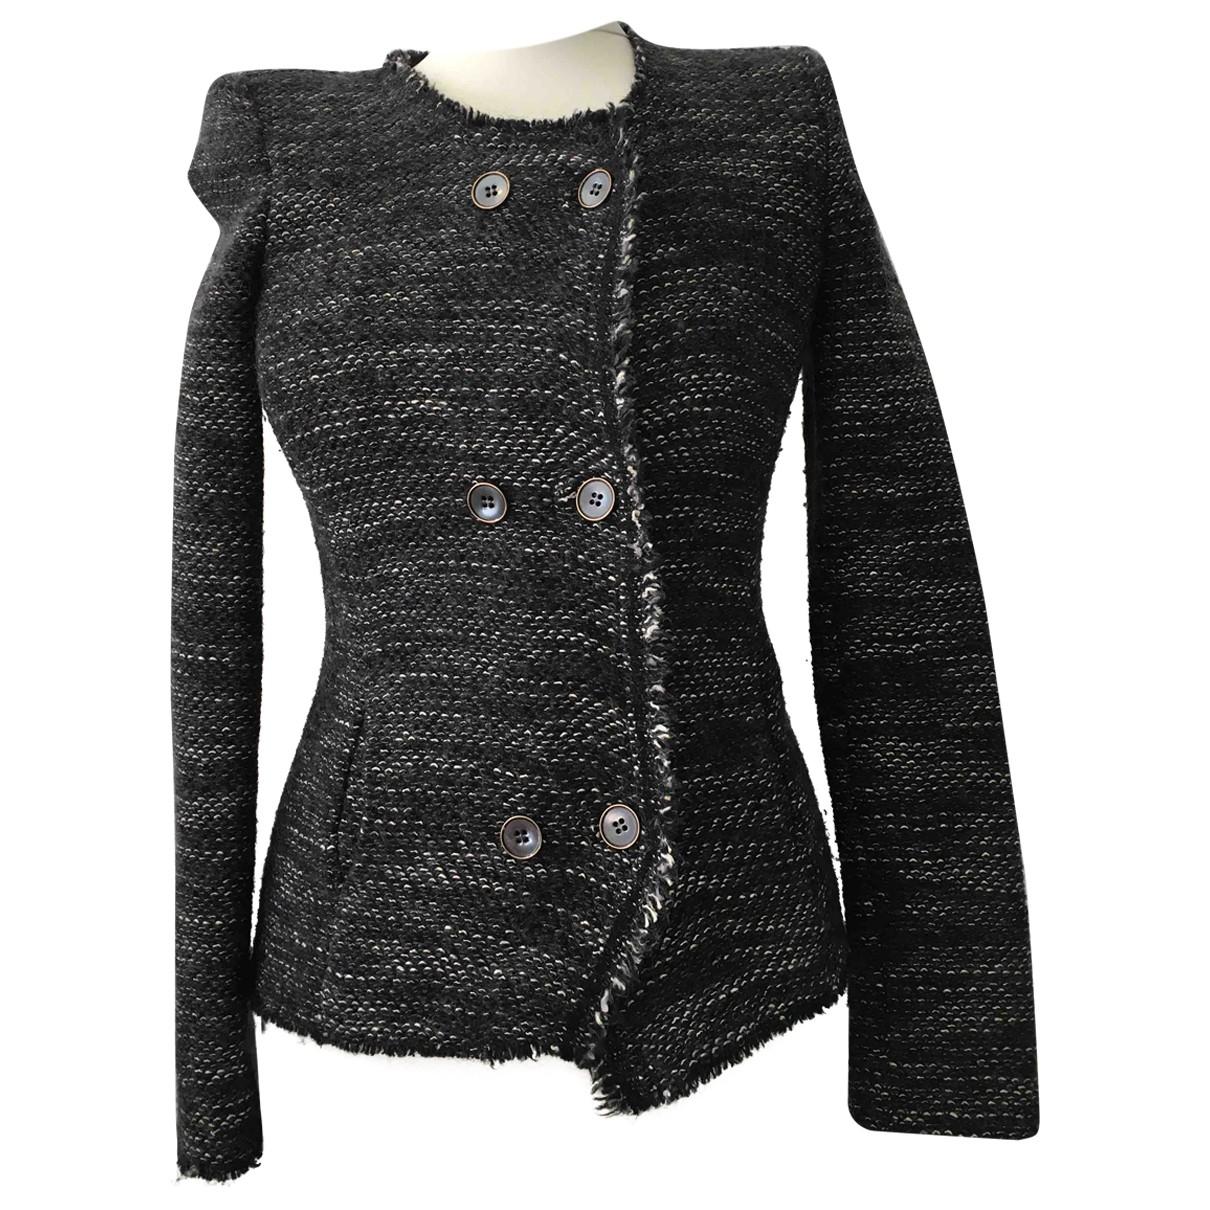 Isabel Marant \N Black Wool jacket for Women 36 FR